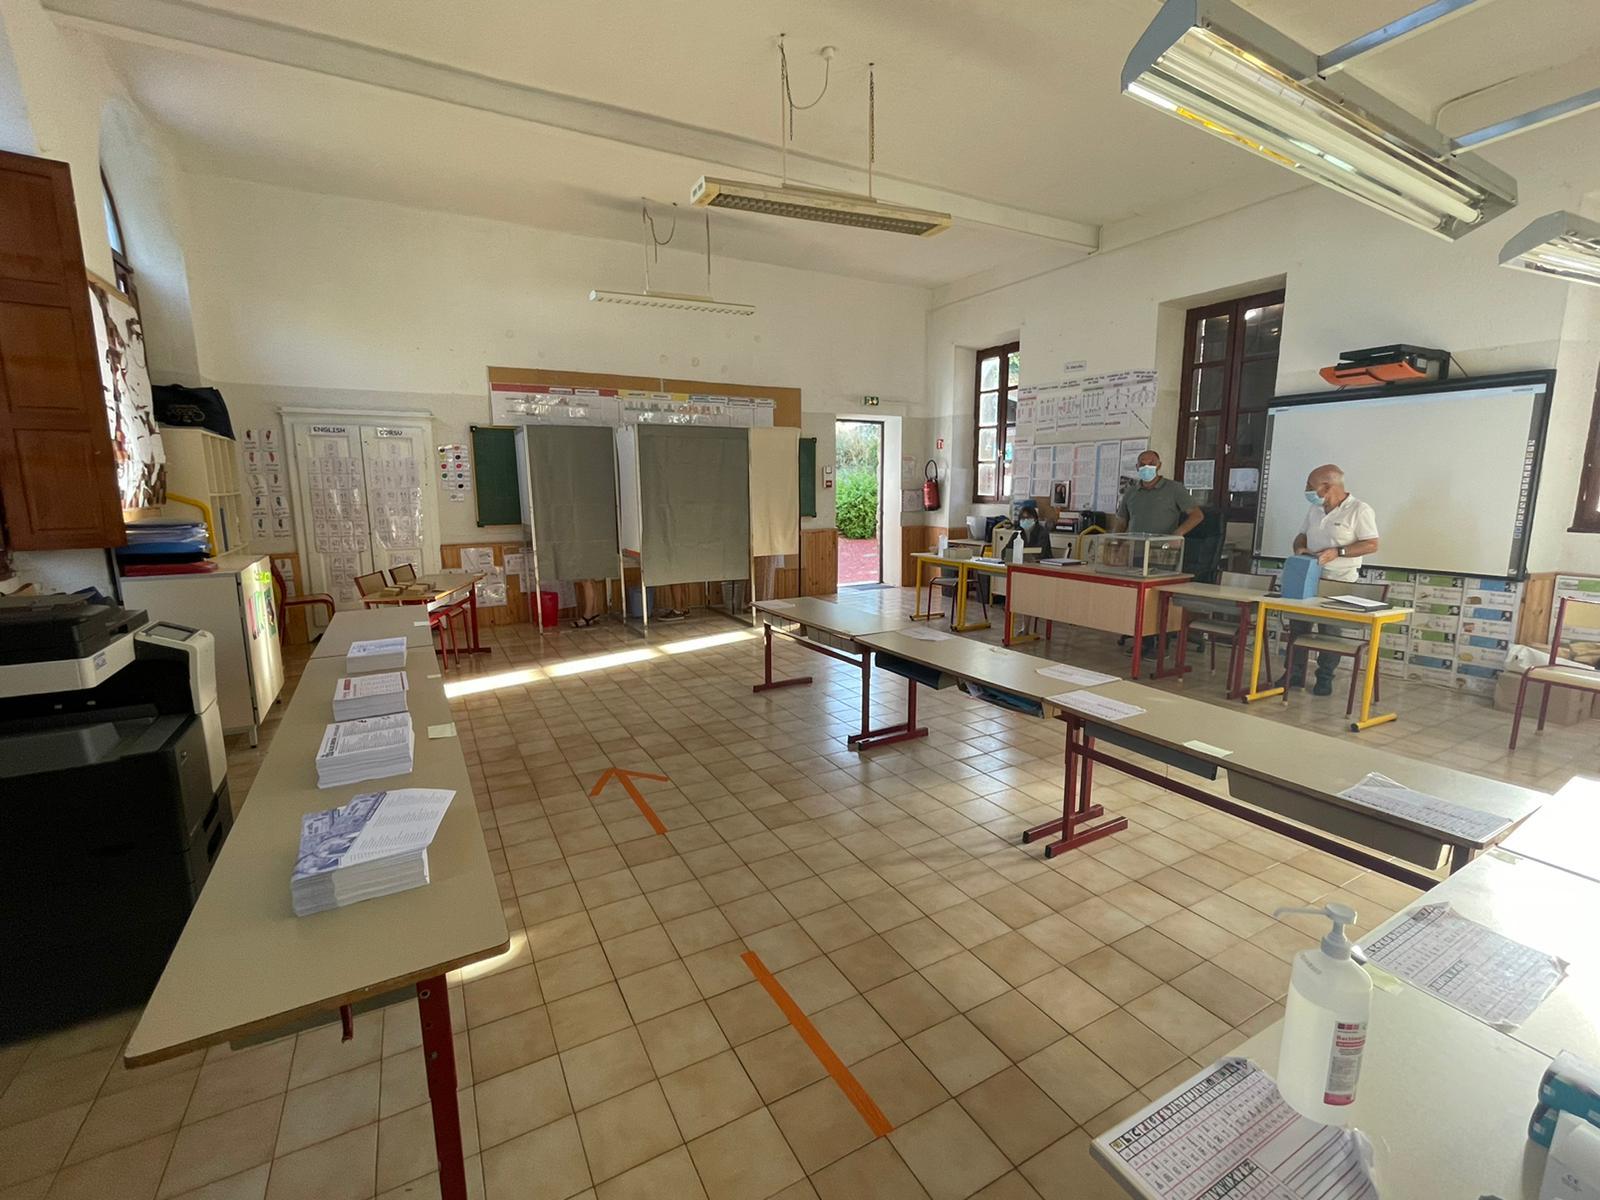 Le bureau de vote de Viggianello